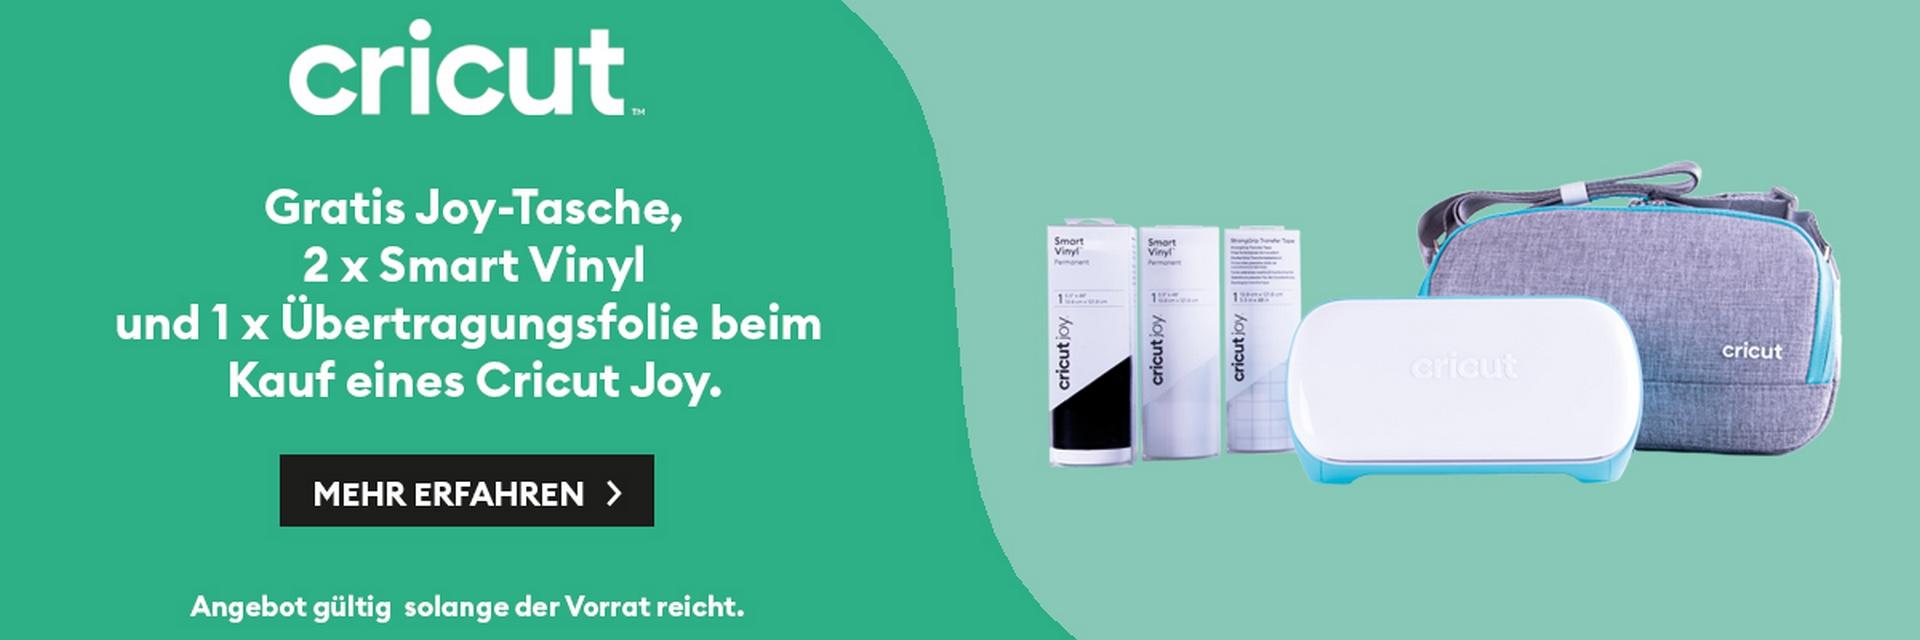 Cricut Promo Joy